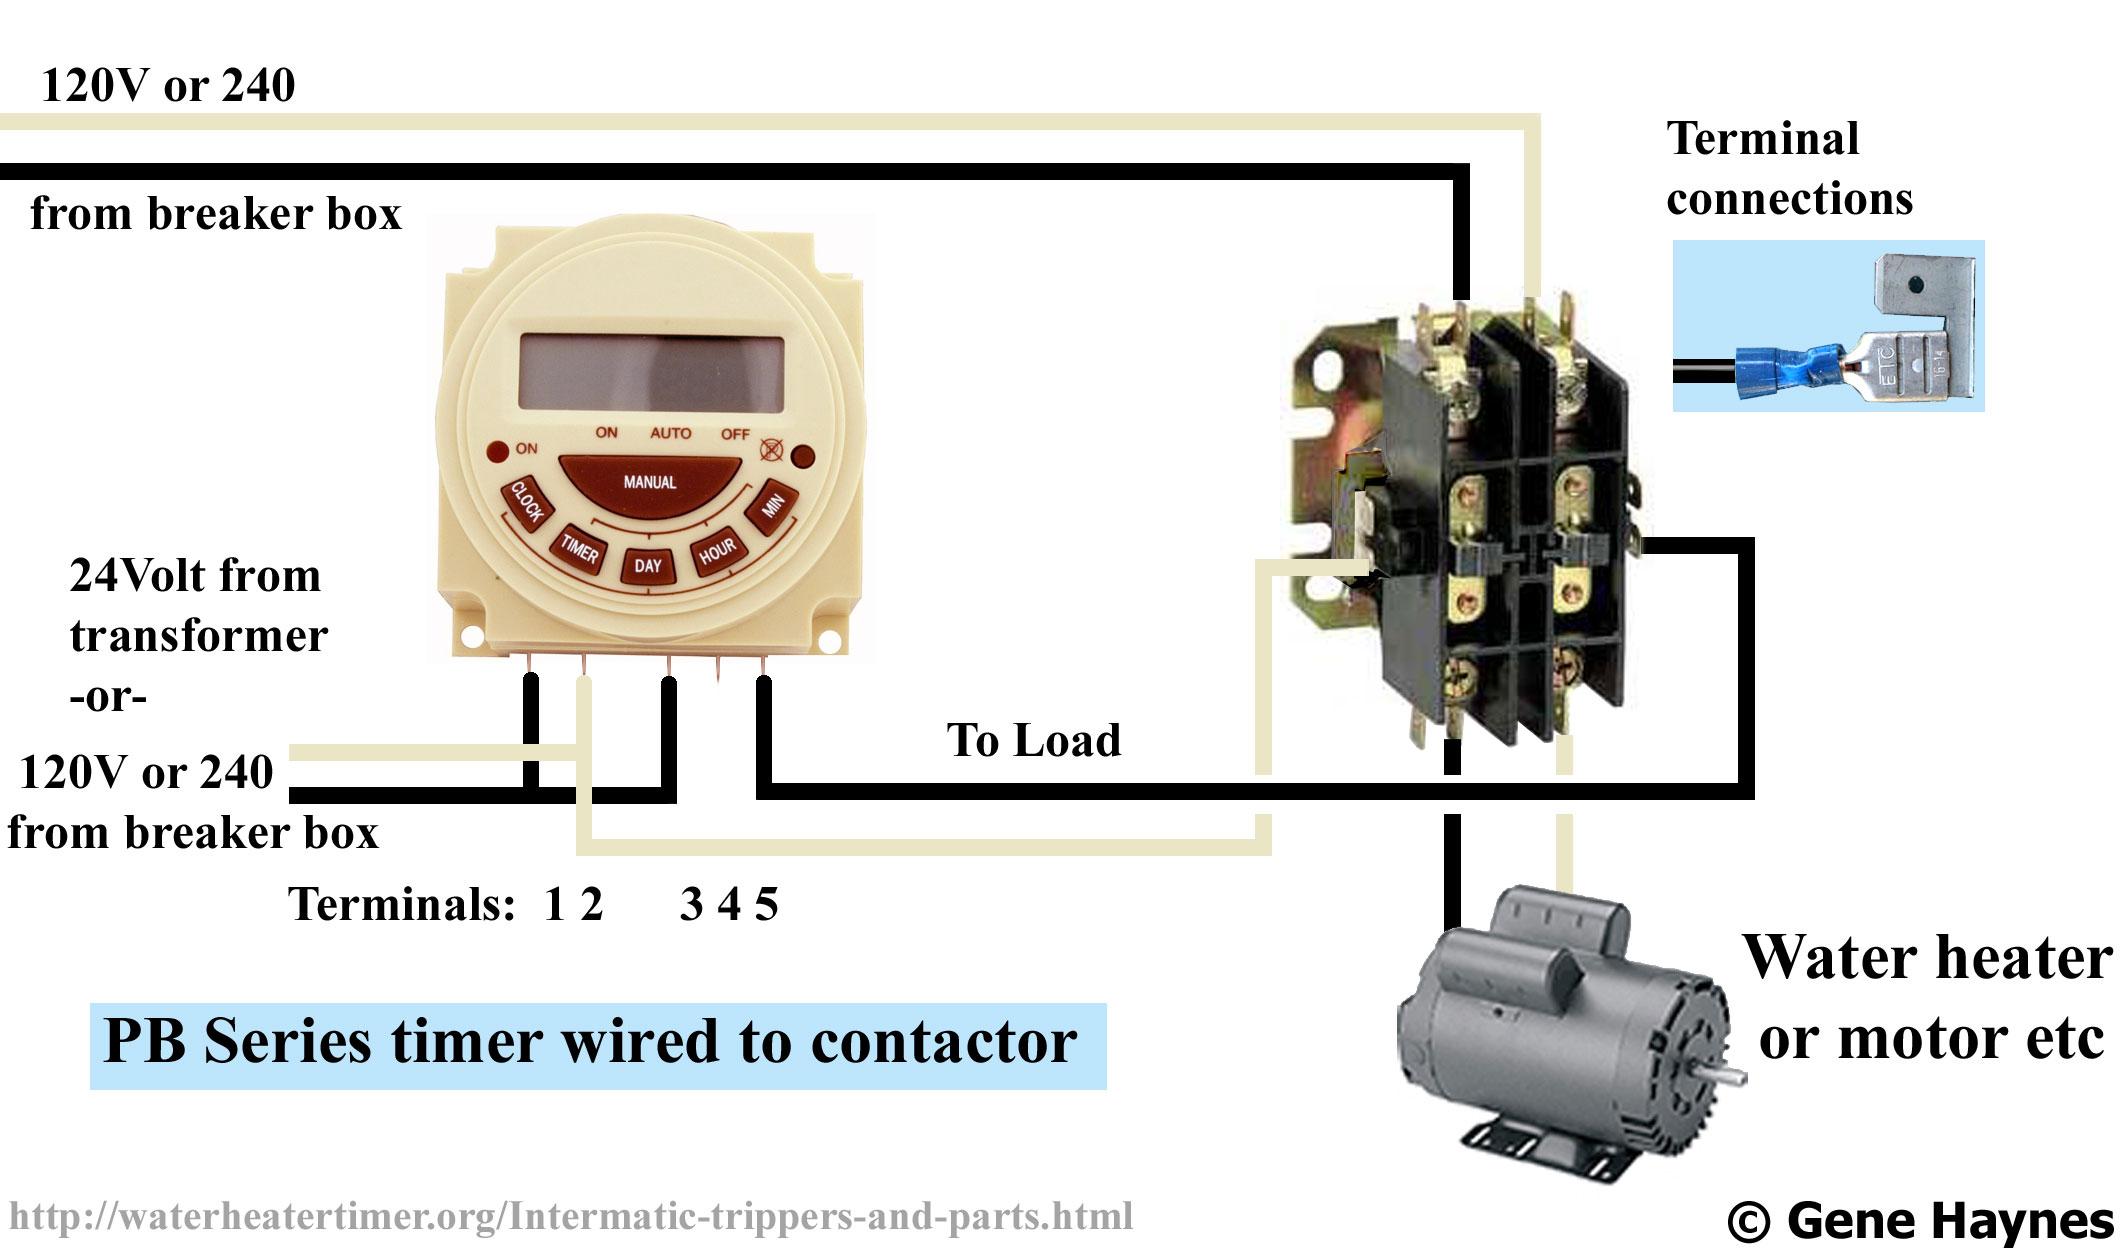 24V Transformer 120 To 24 Volt Transformer Wiring Diagram from 2020cadillac.com